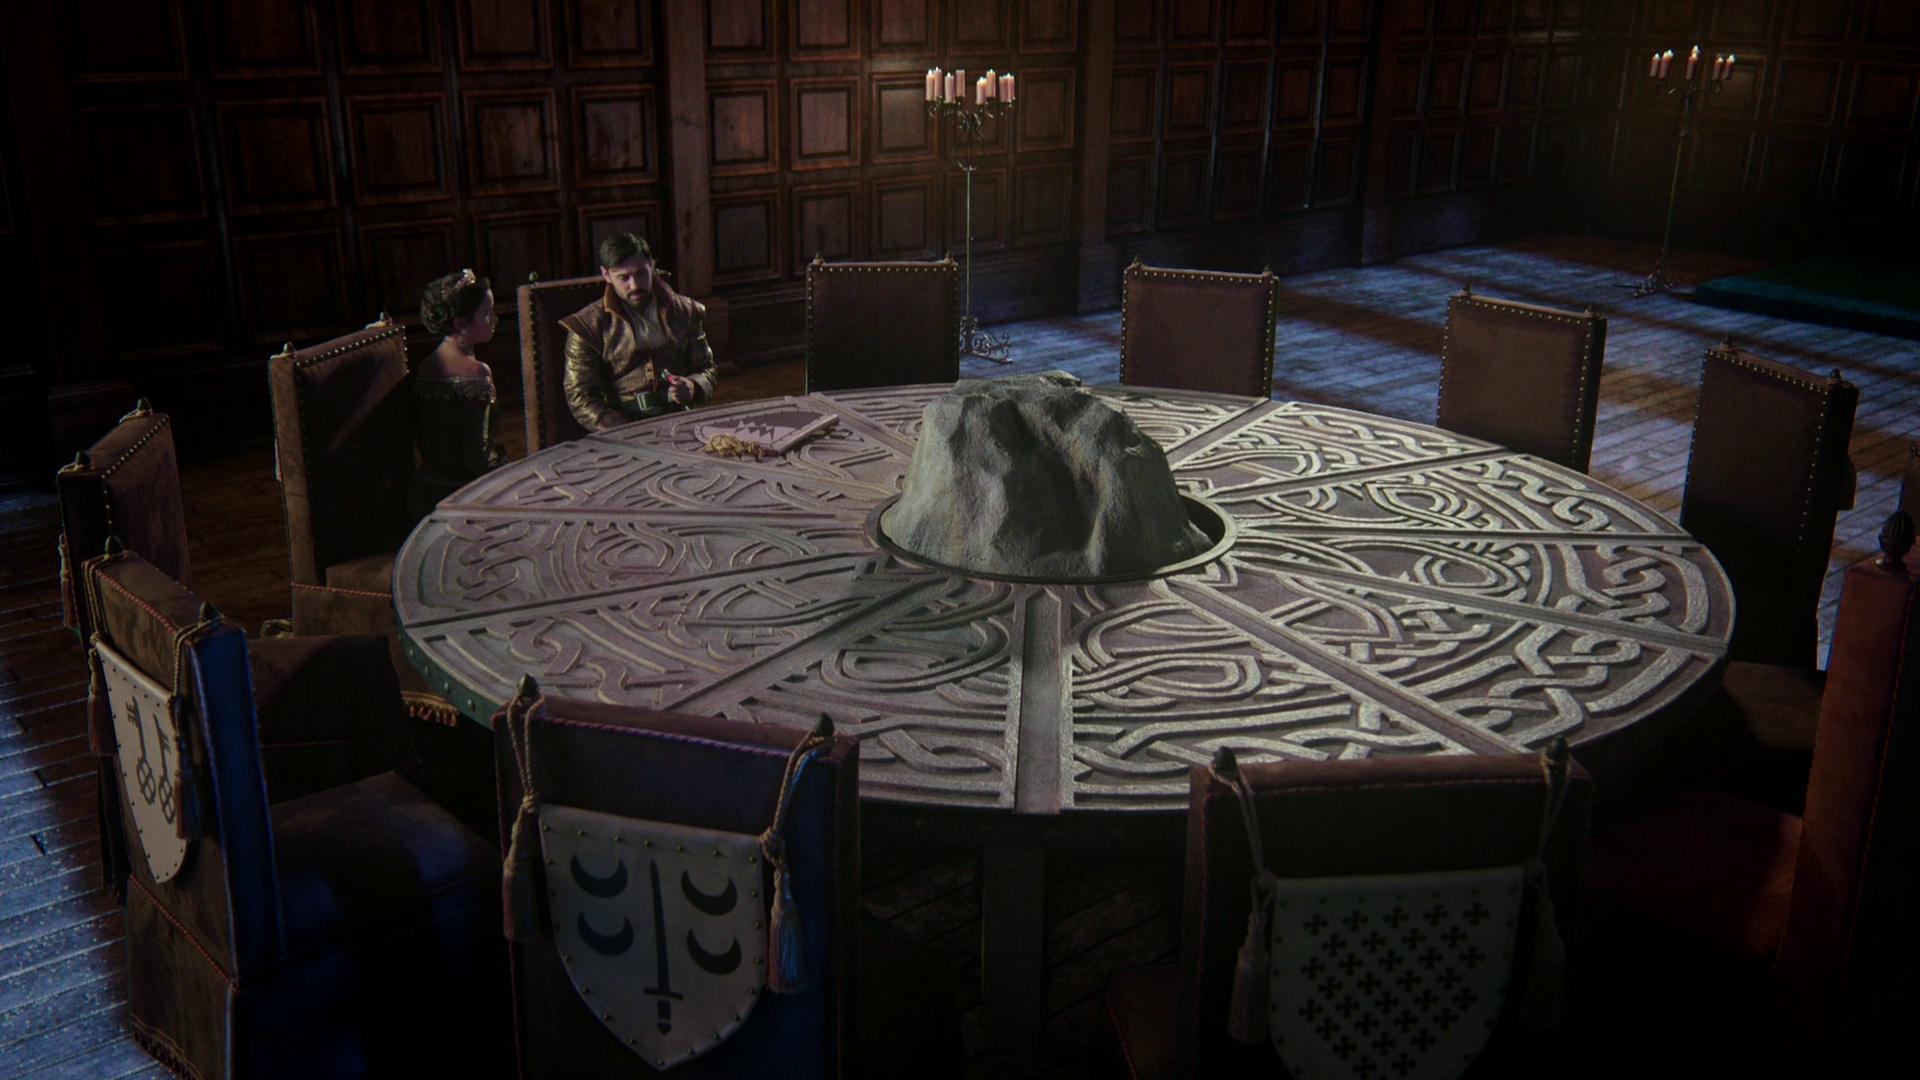 было картинки с круглым столом короля артура болтами крепится фундаменту